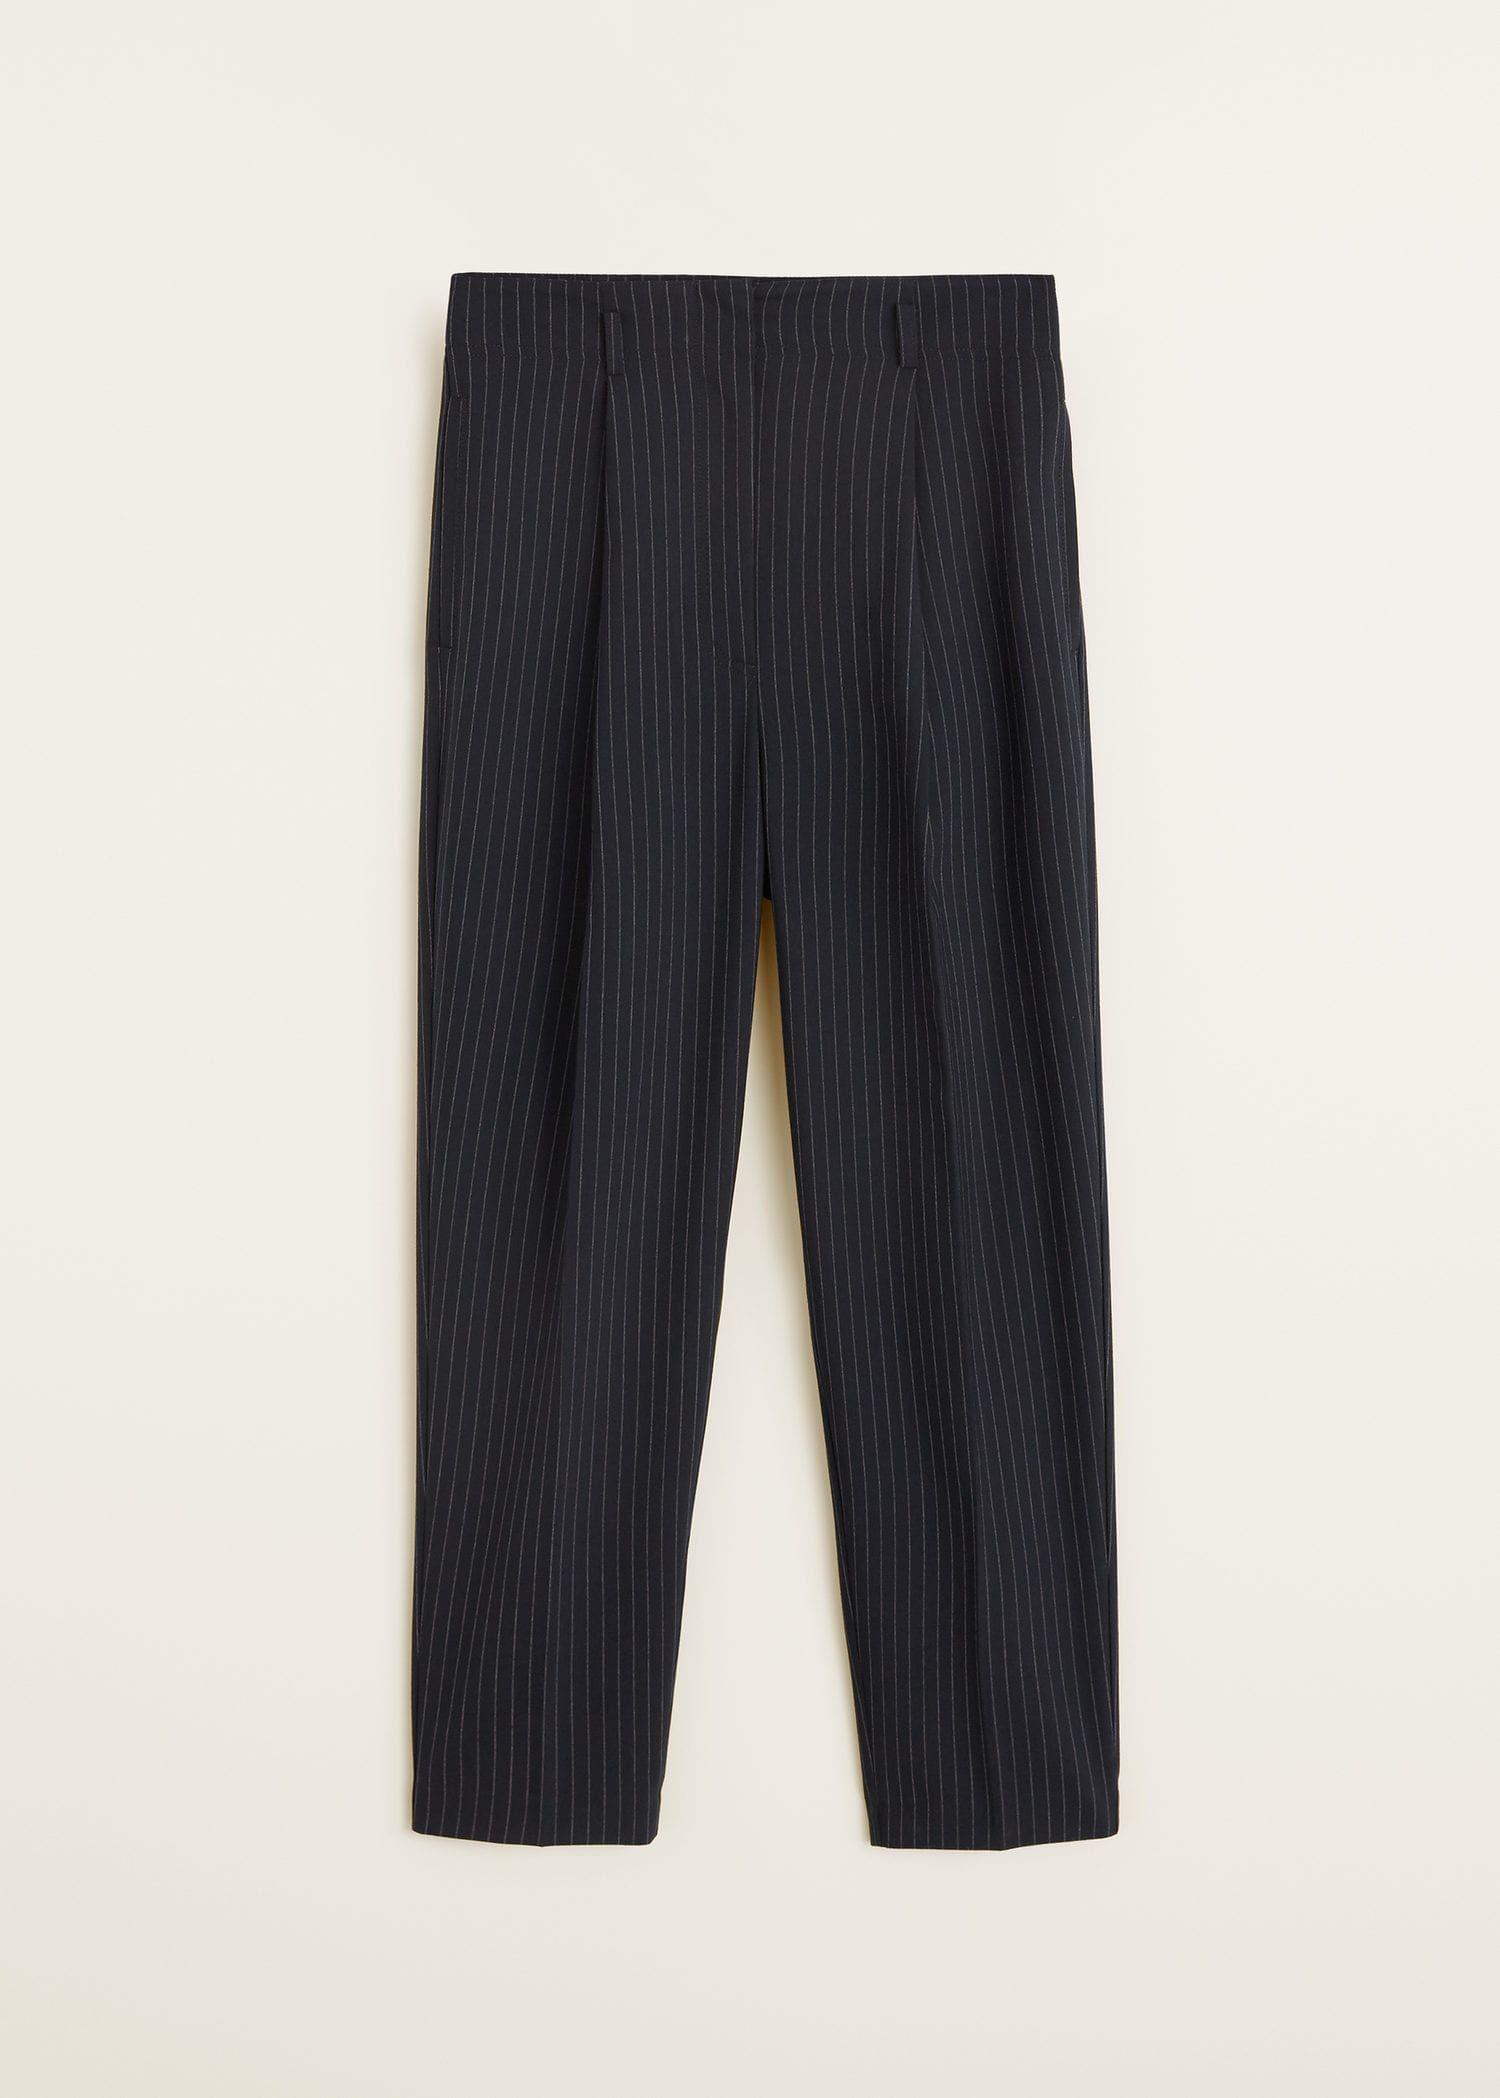 Mango Diplo Dark Navy Pinstripe Suit Pants